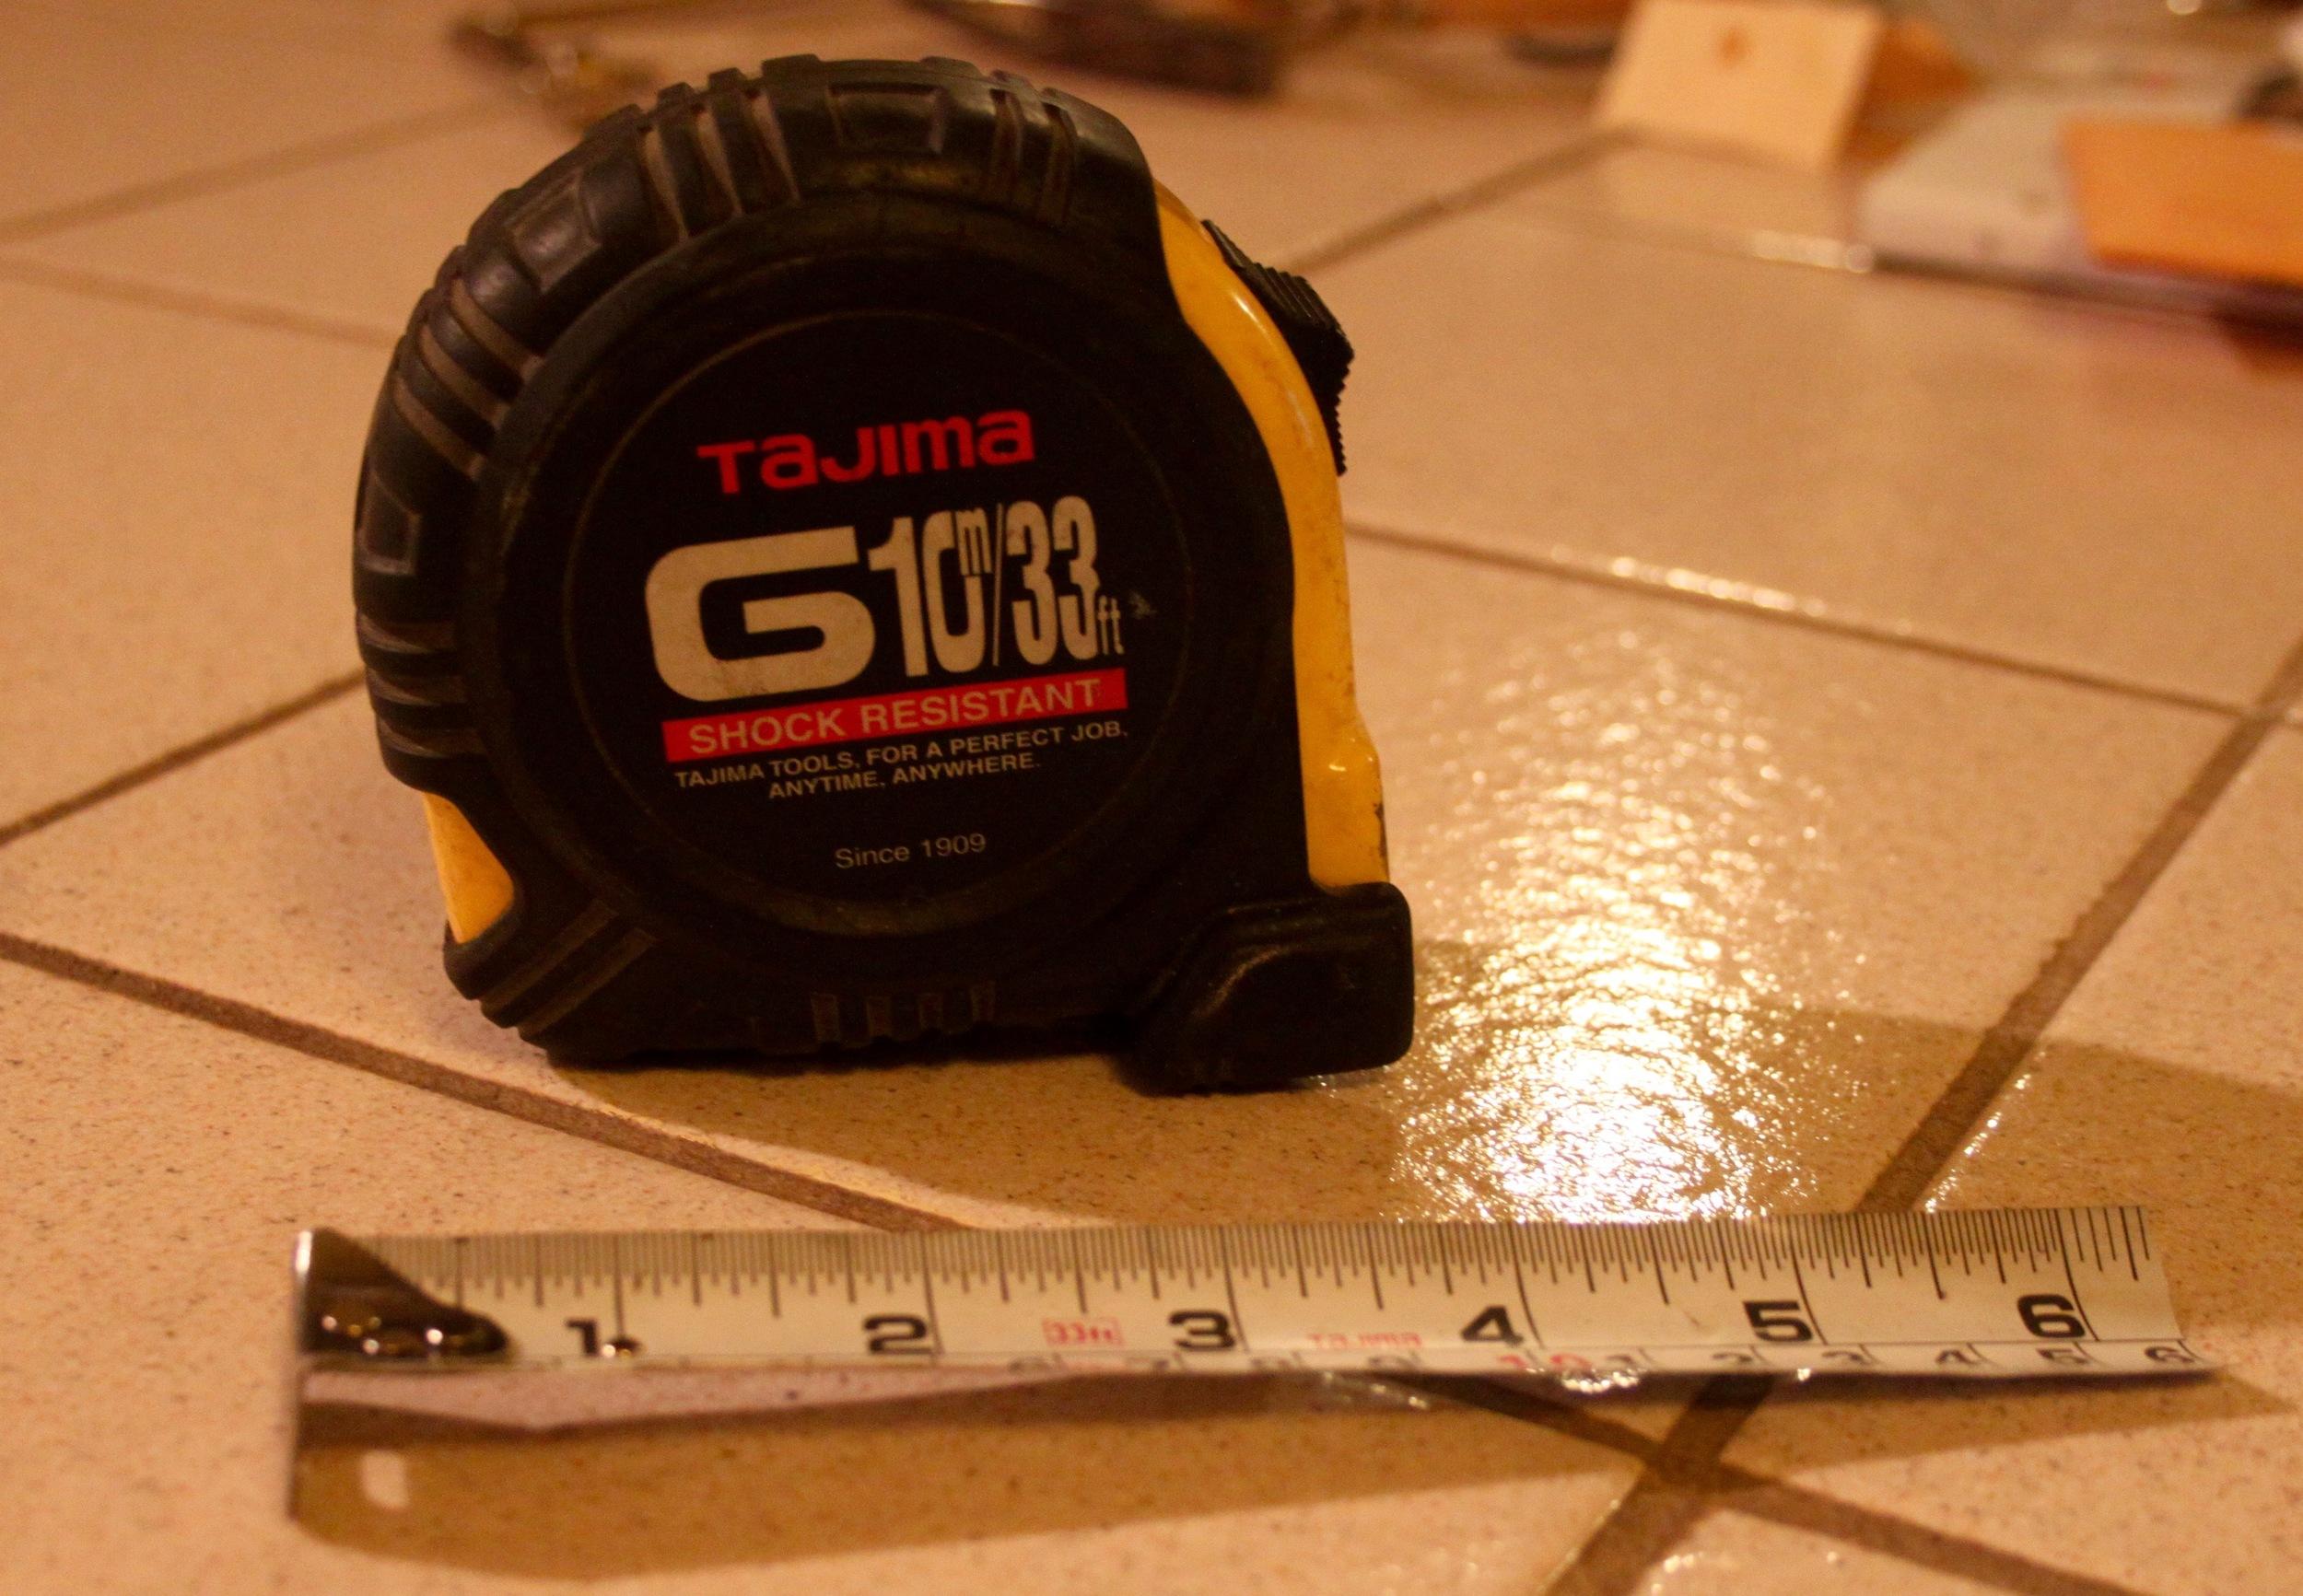 My broken Tajima tape measure with zero customer service...sigh.